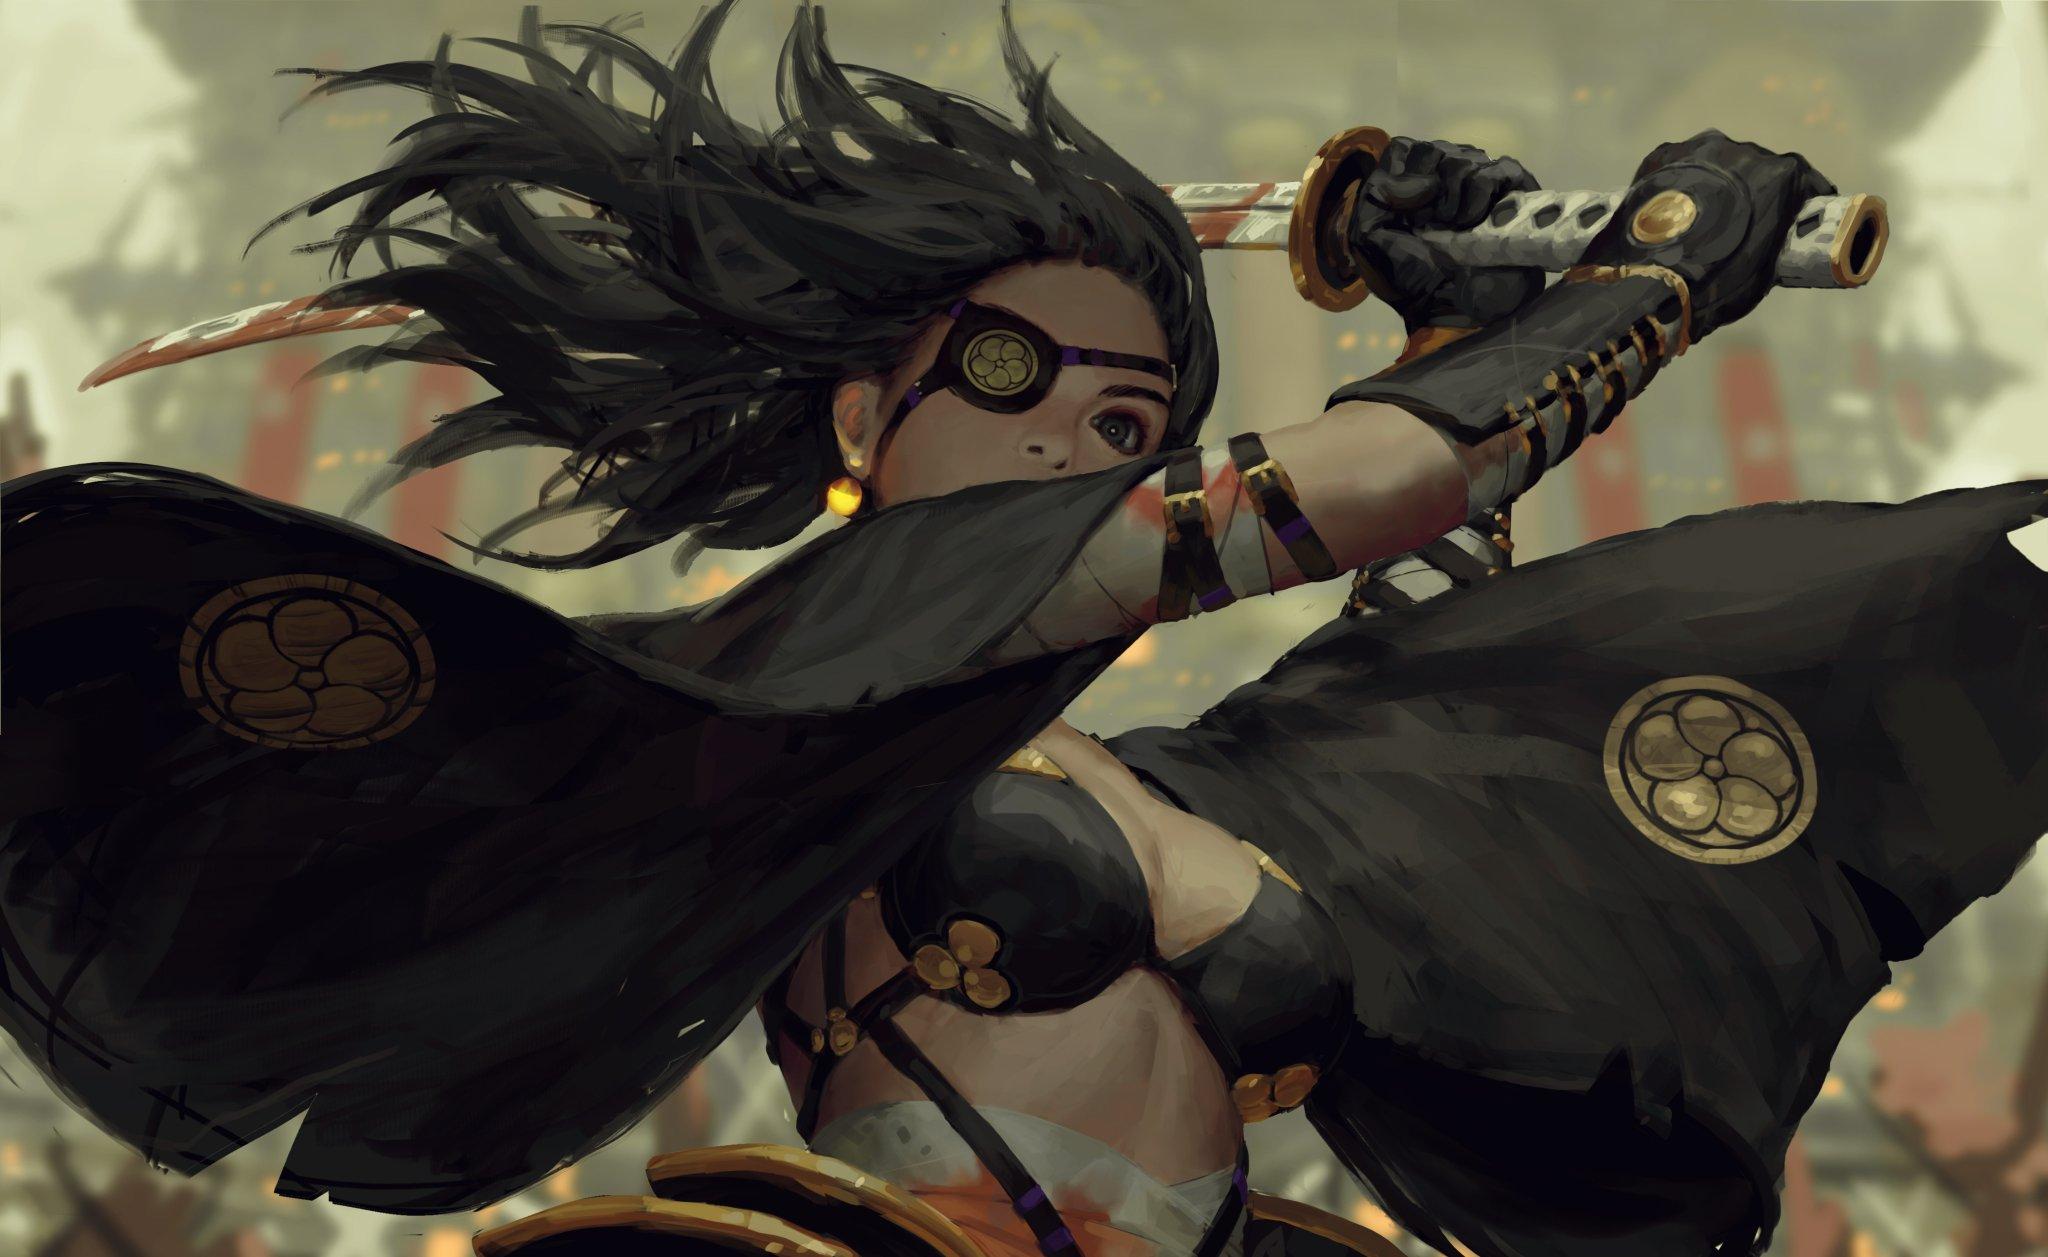 General 2048x1257 GUWEIZ samurai warrior katana fantasy girl cleavage bra eyepatches sword dark hair Z.W. Gu